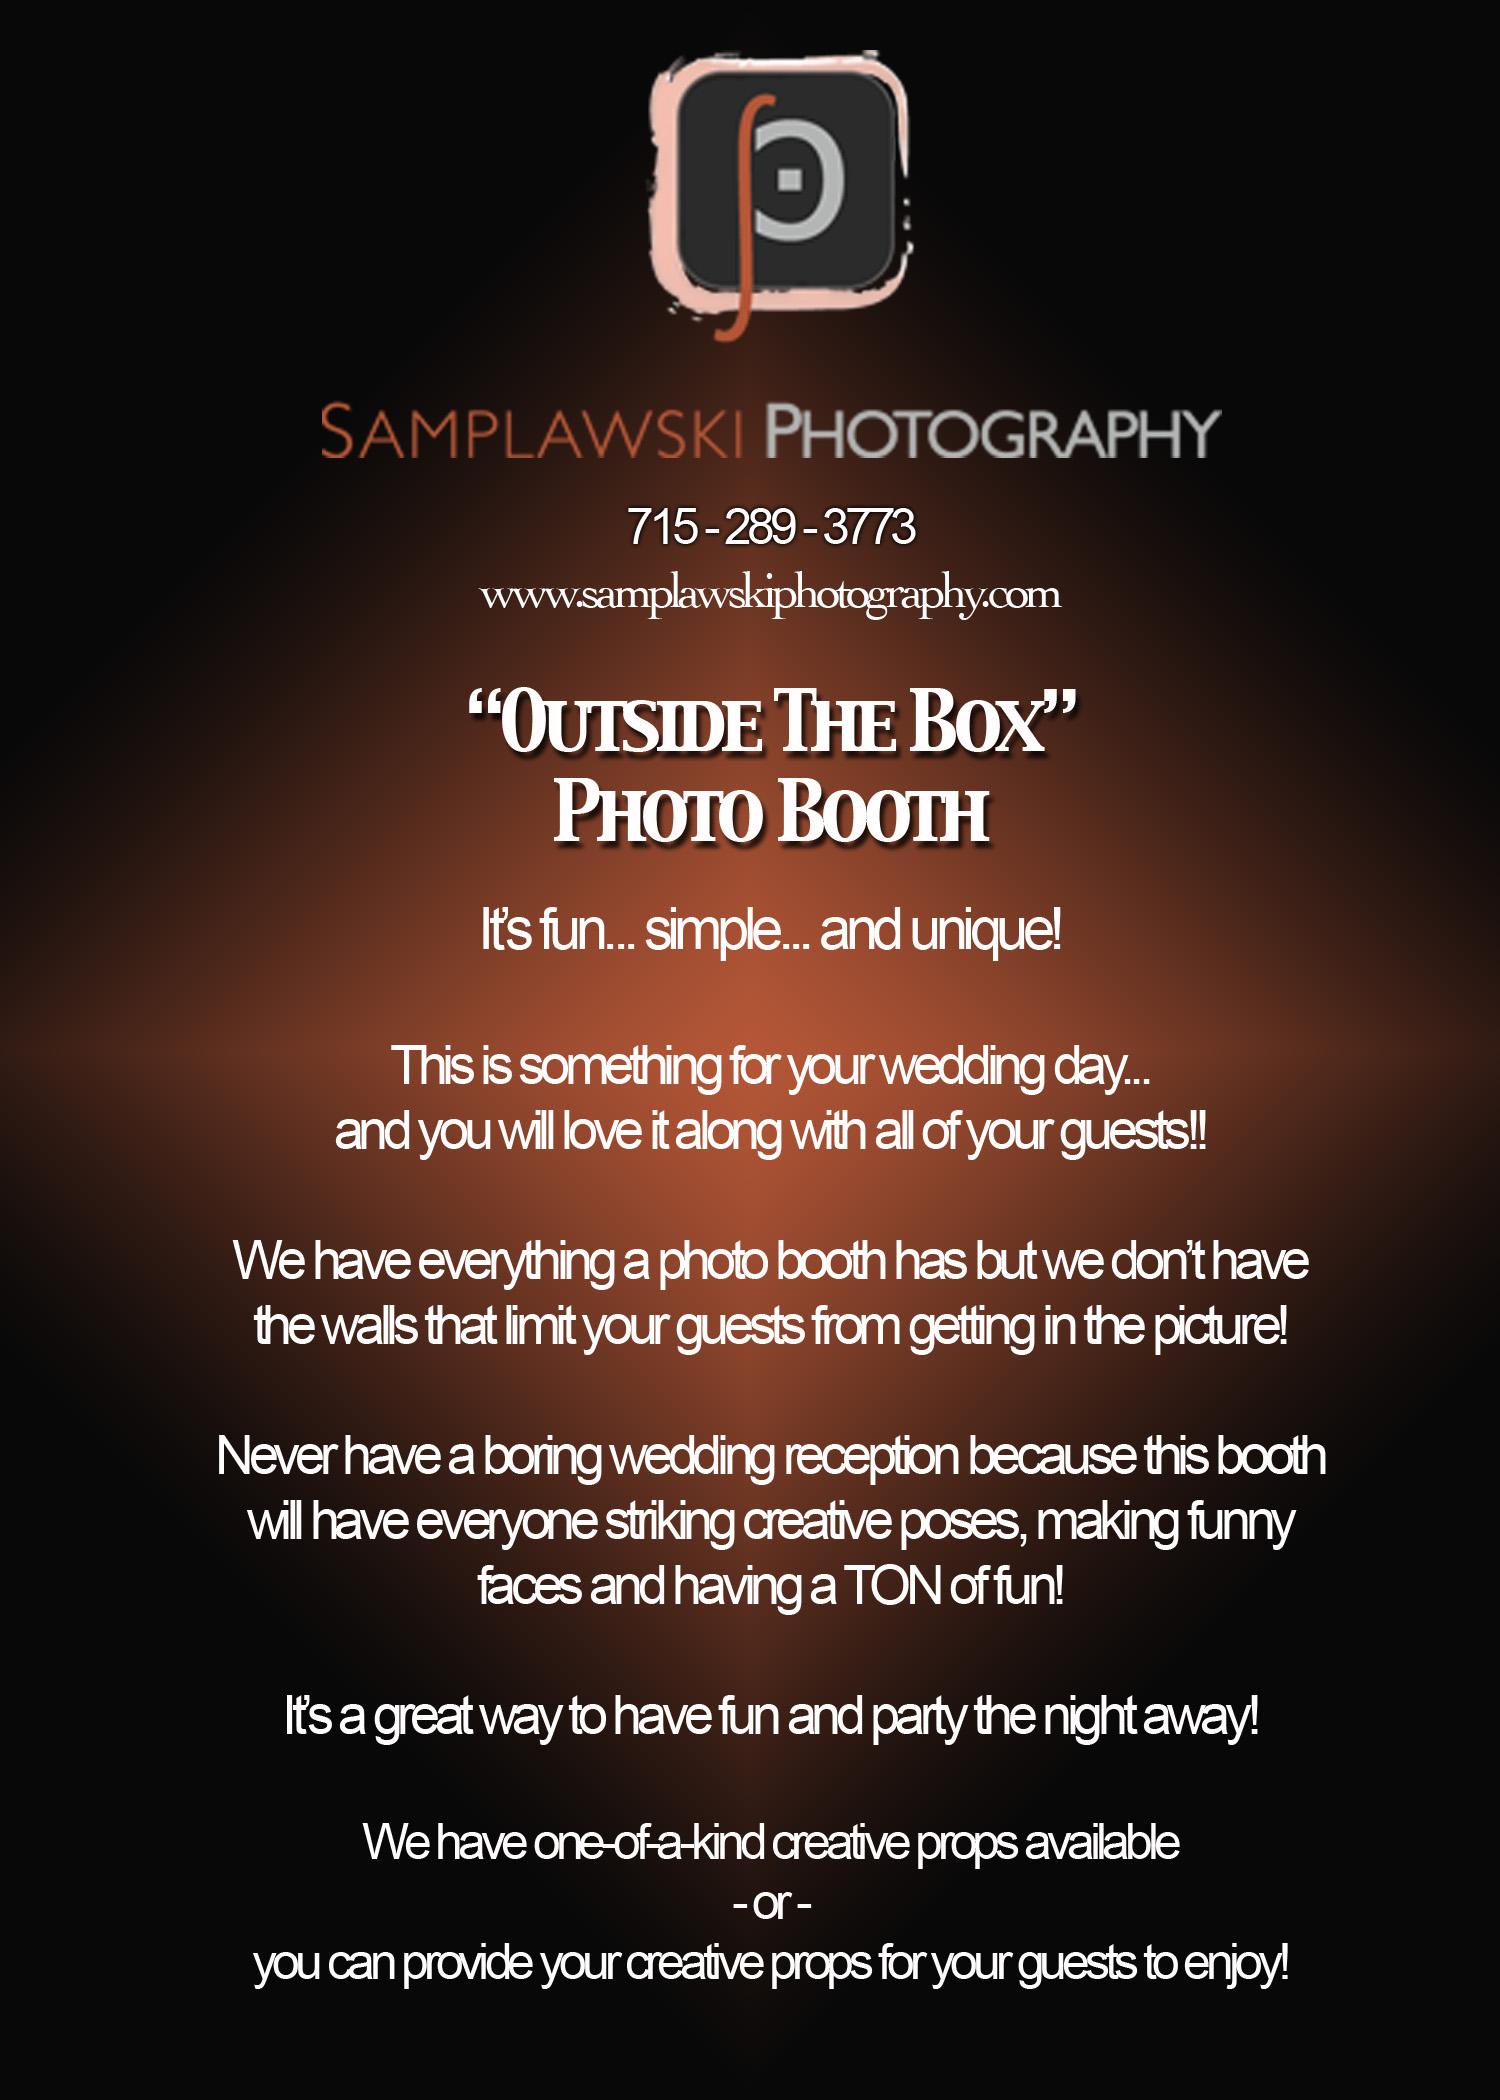 Senior Photography Archives | Andrew Samplawski Photography